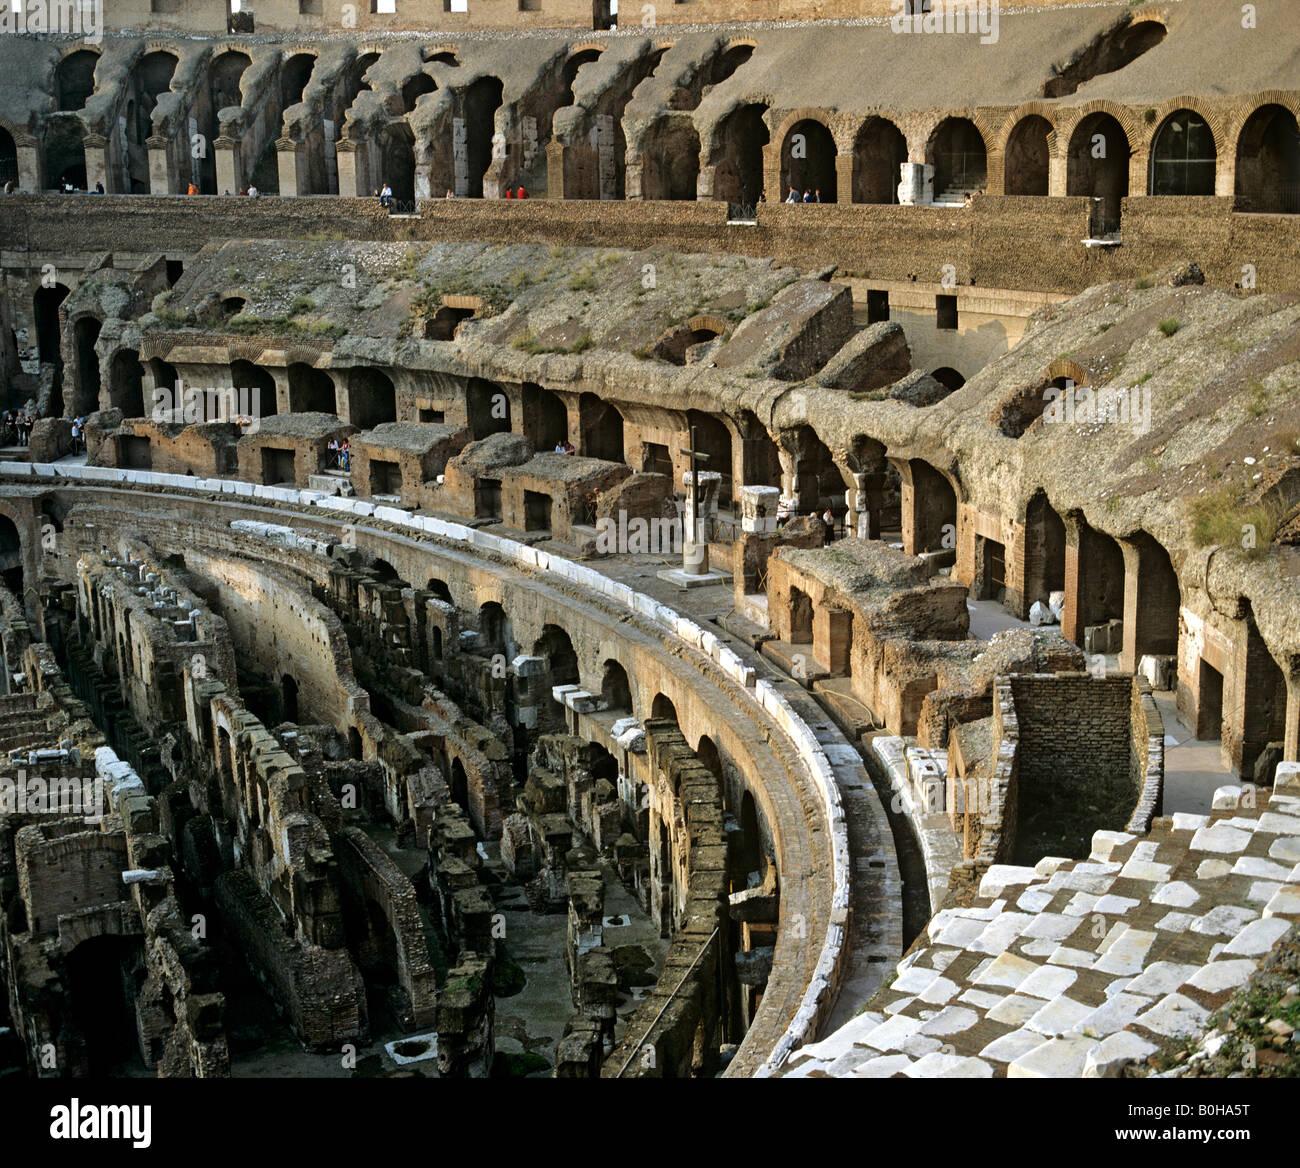 Colosseum, interior, underground structure, hypogeum, amphitheatre, Rome, Italy - Stock Image